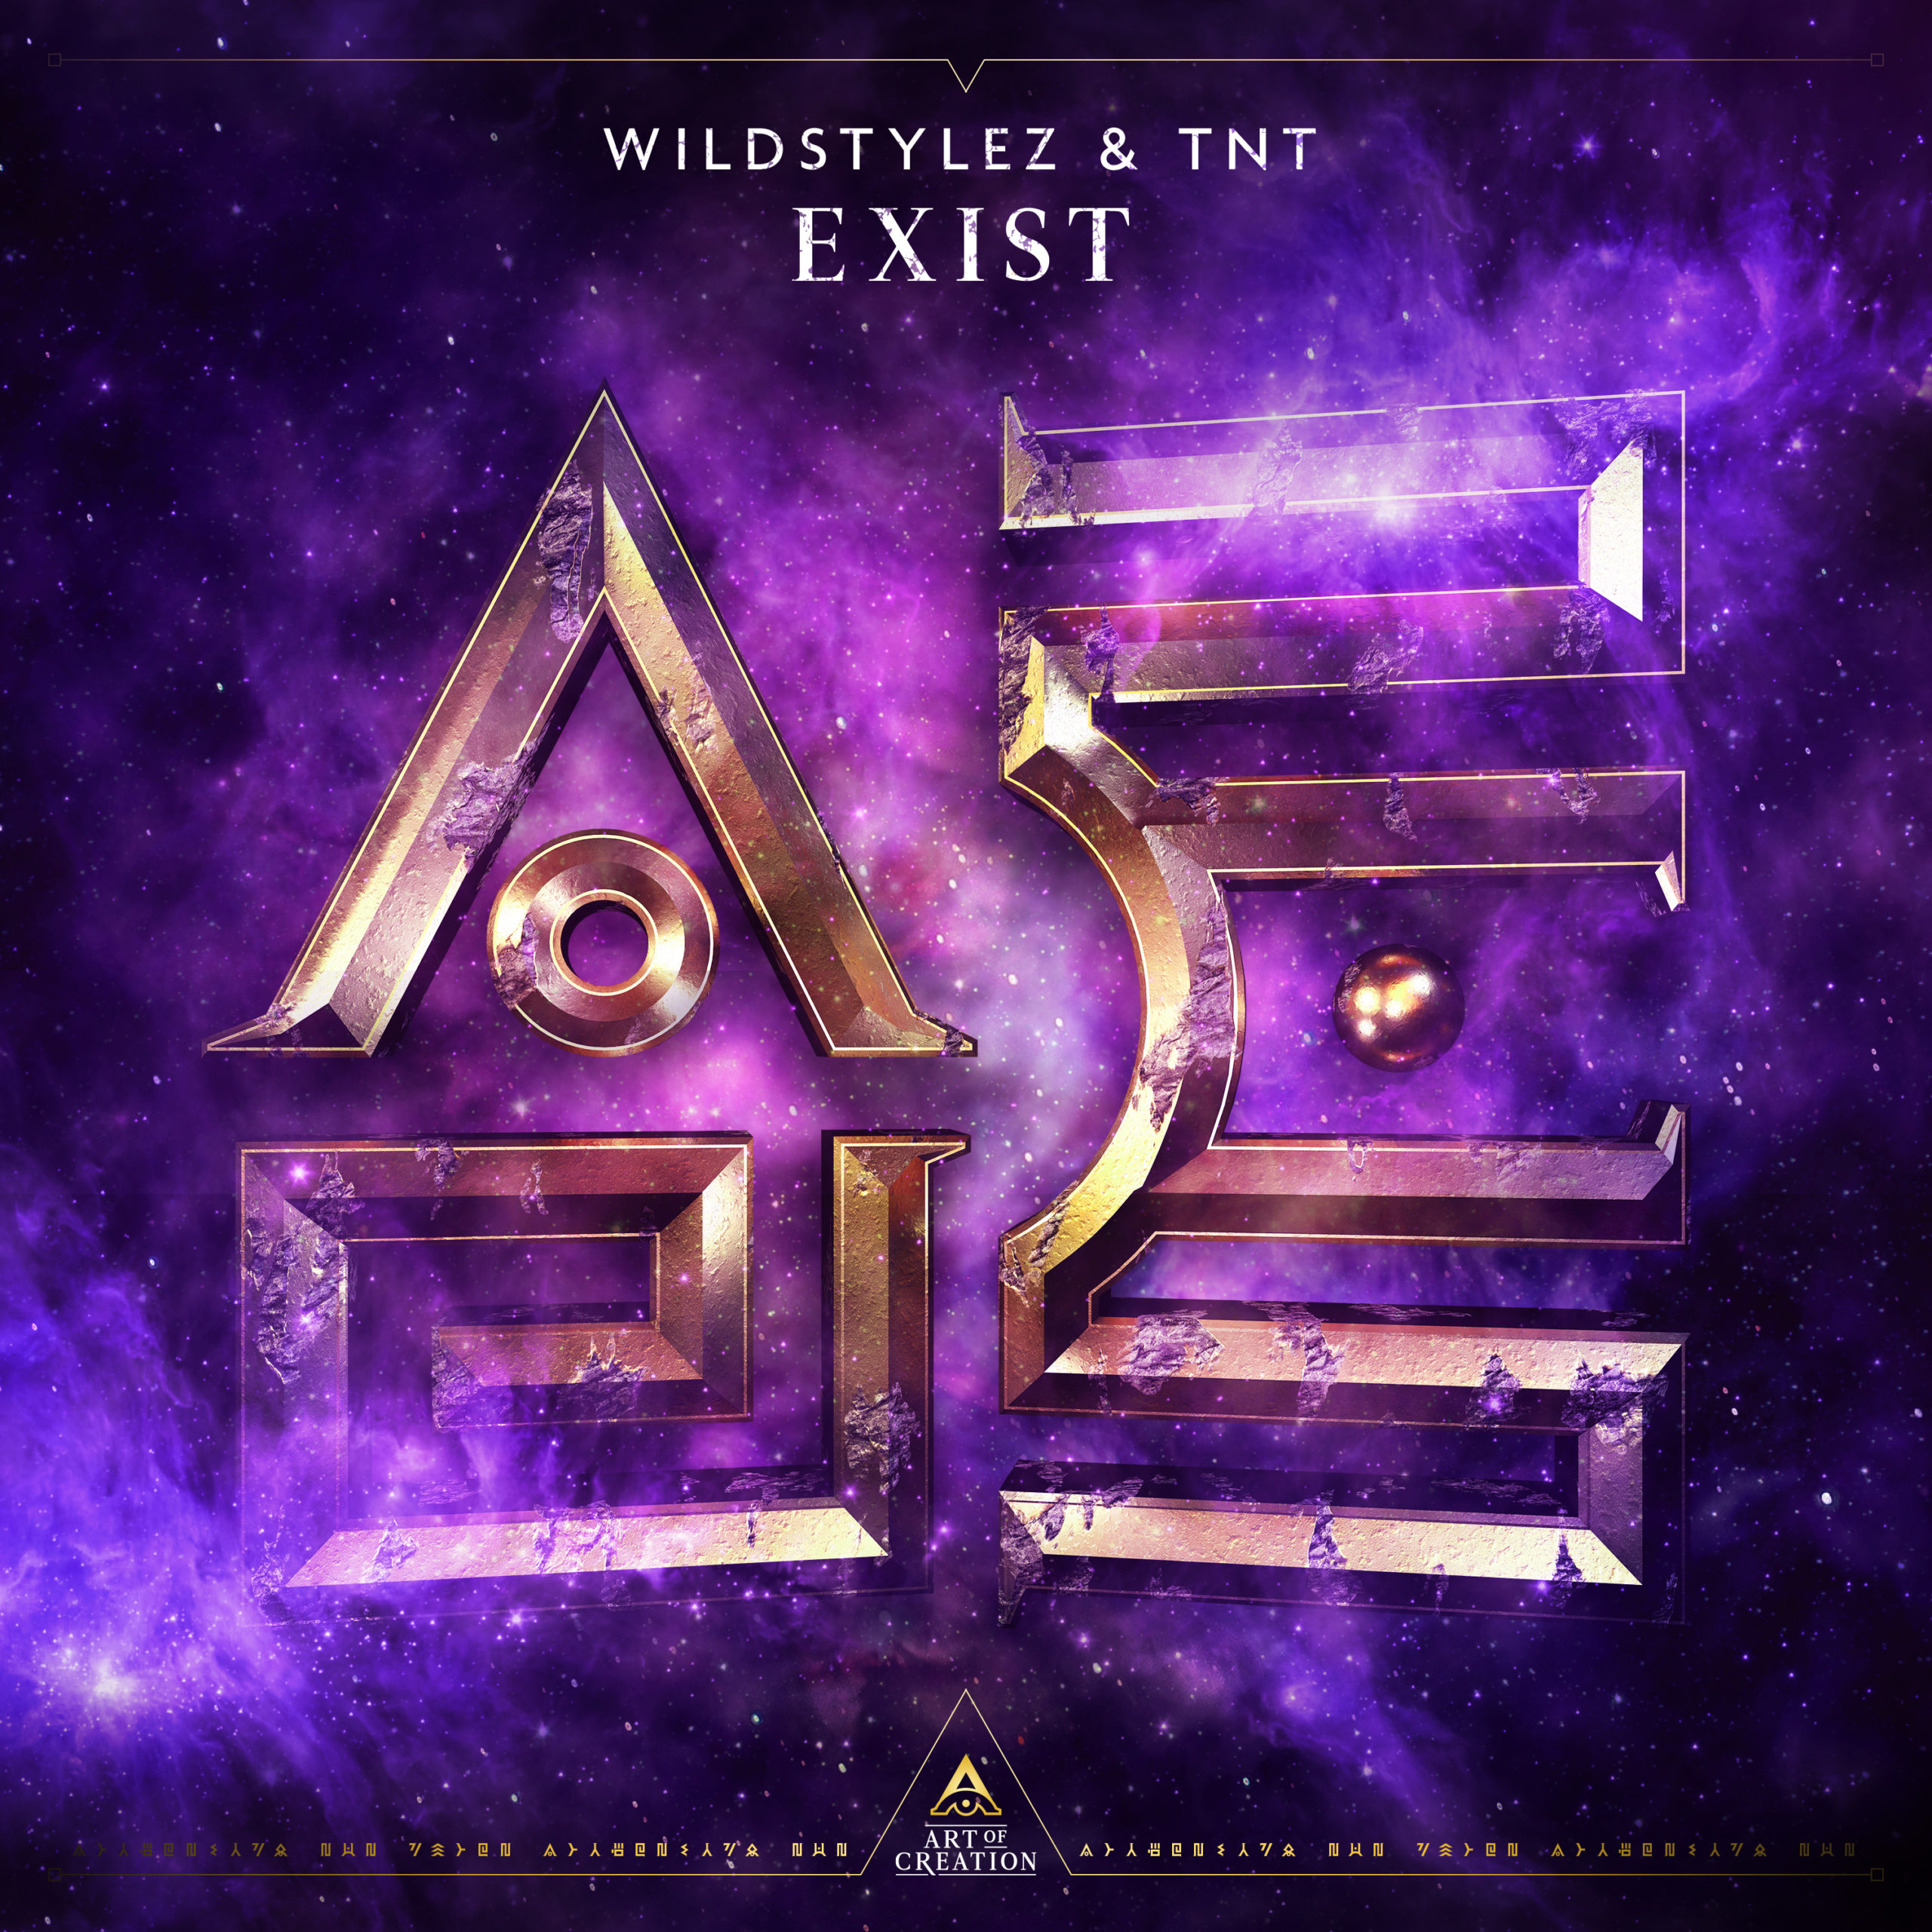 Wildstylez & TNT - Exist